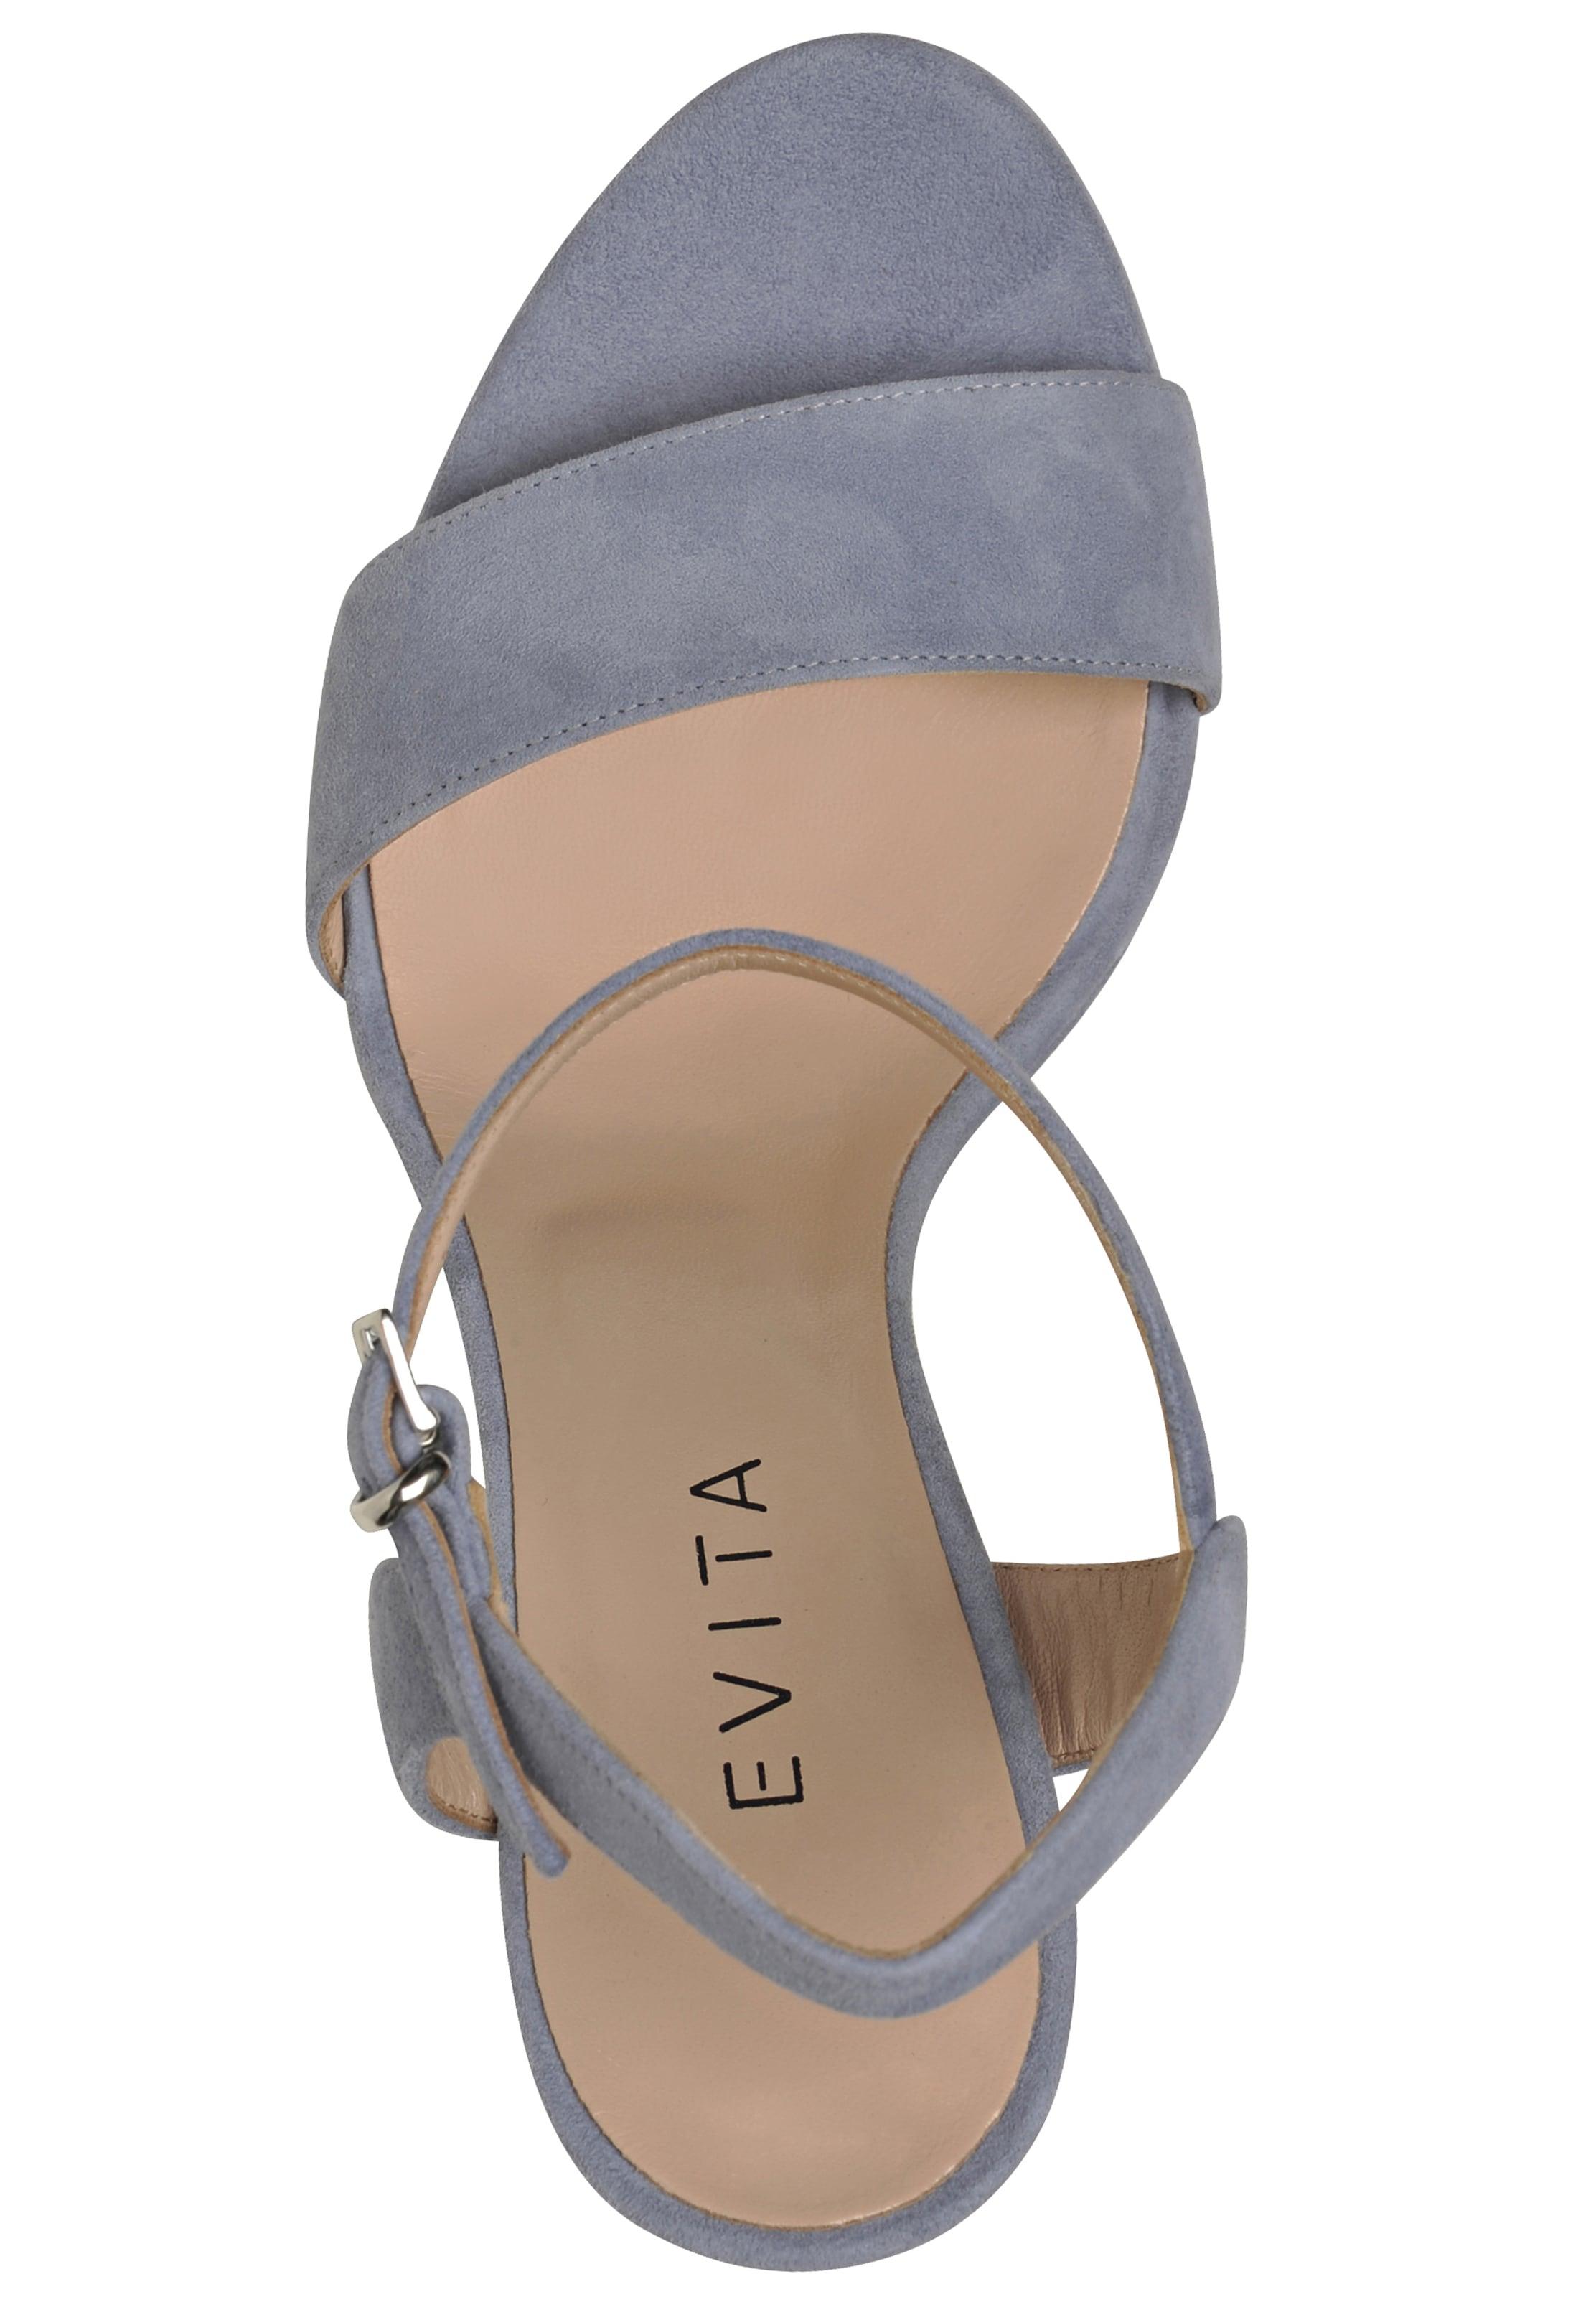 In Evita Evita Sandalette Hellblau Sandalette In In Evita Evita Sandalette Hellblau In Hellblau Sandalette gvfYb6y7